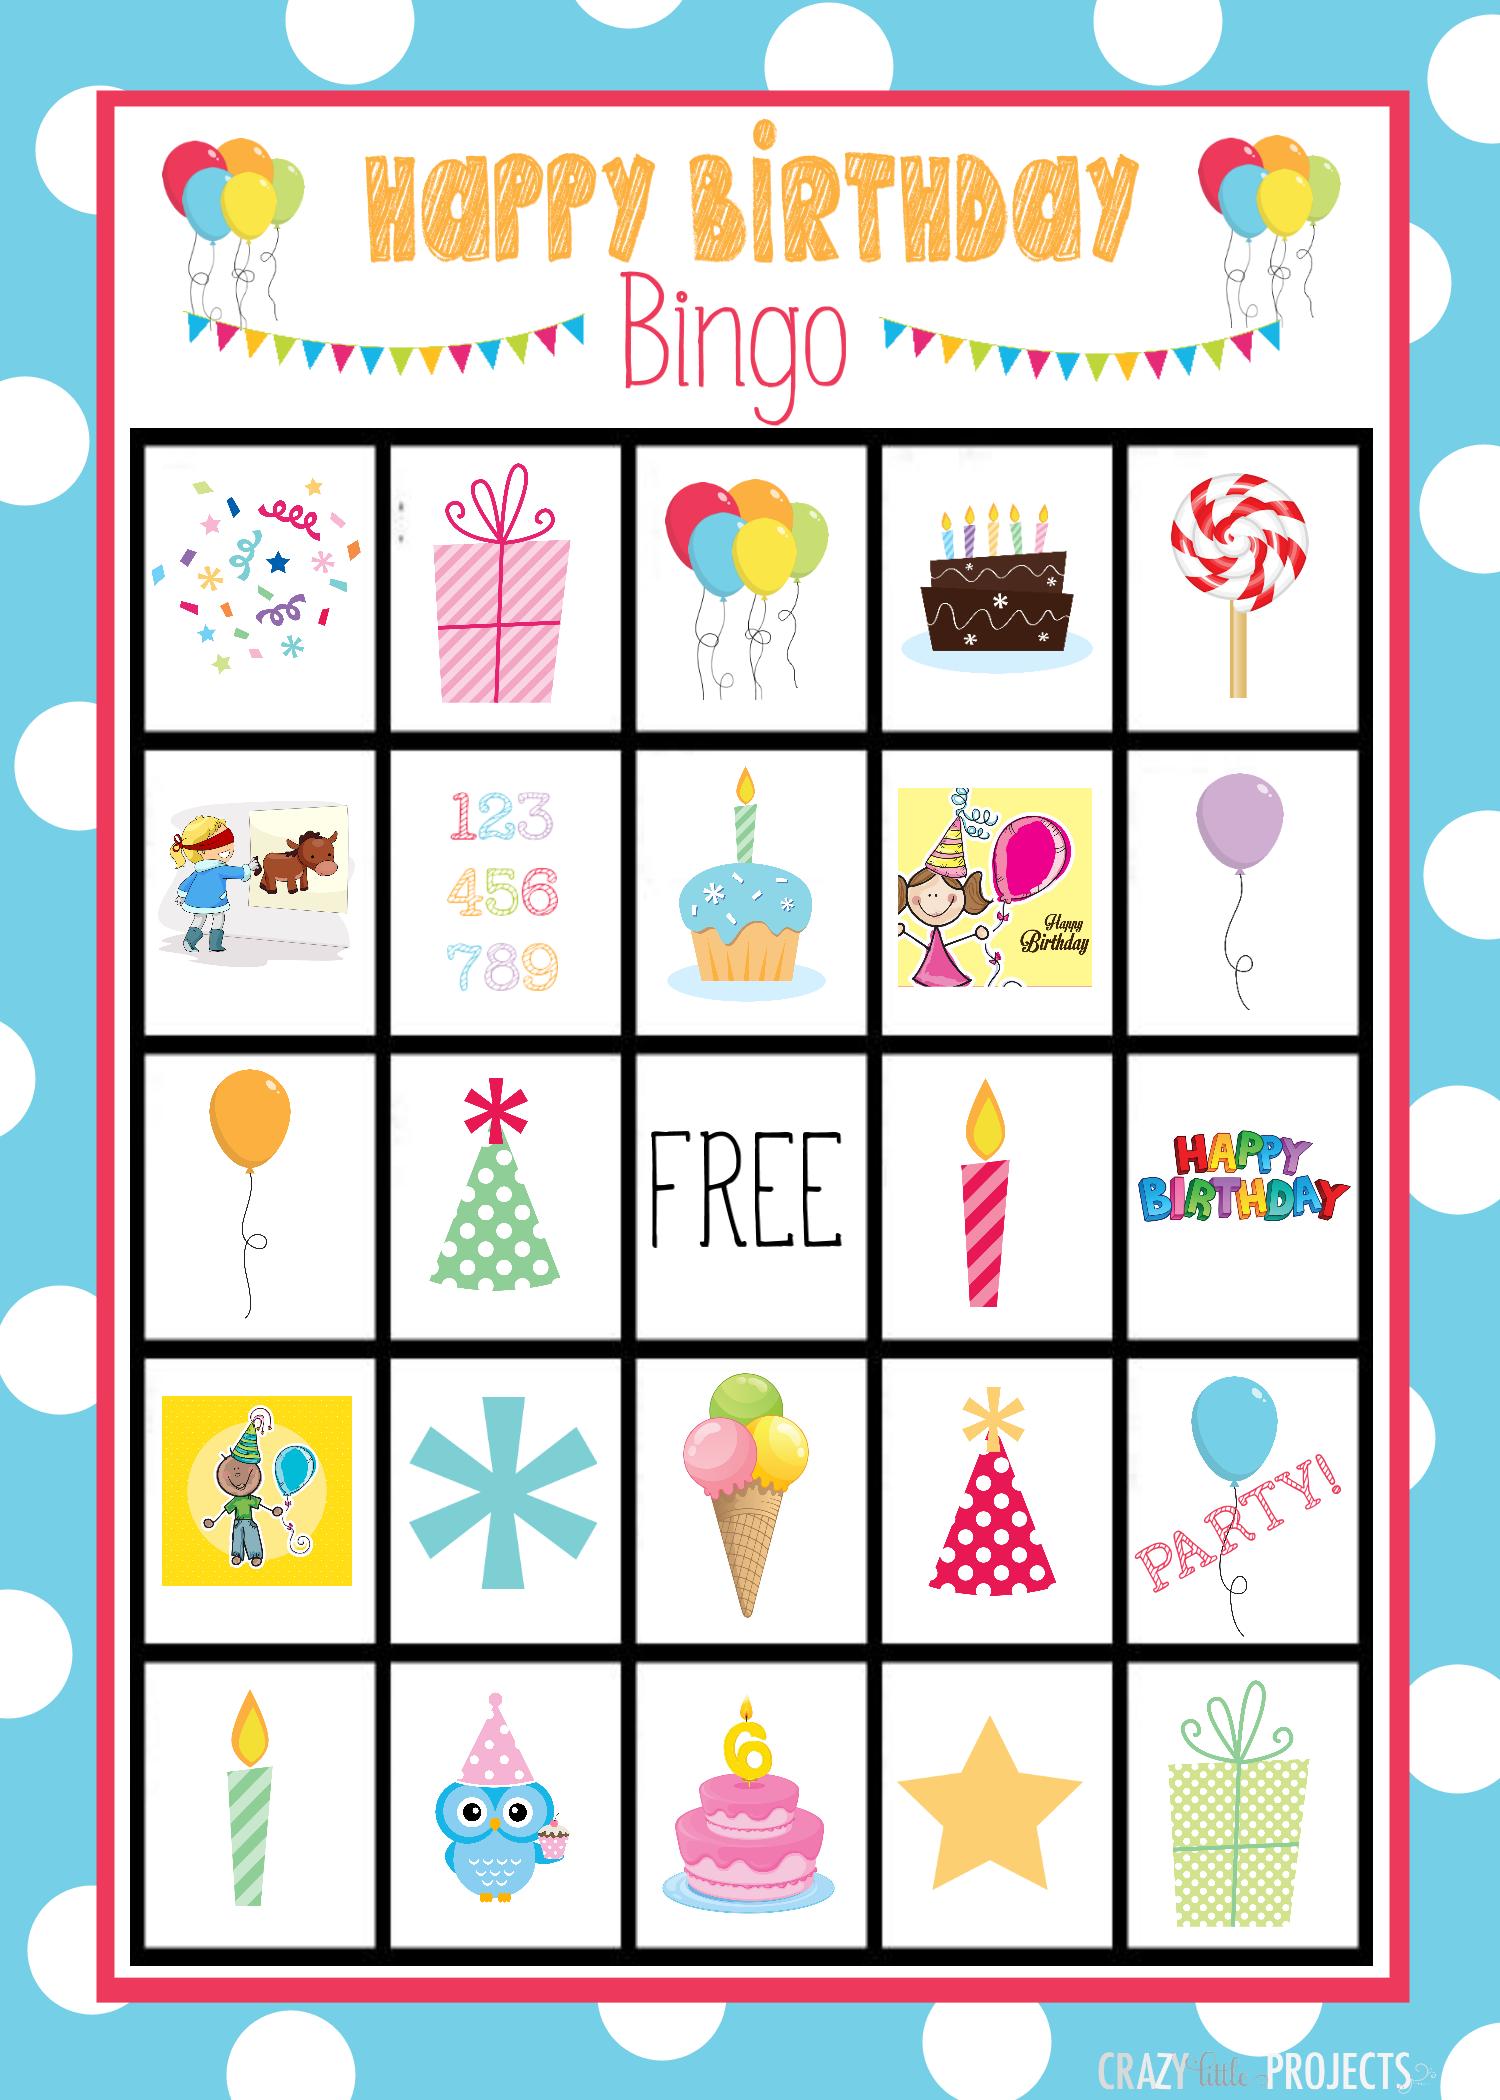 Cute Free Printable Birthday Bingo Game